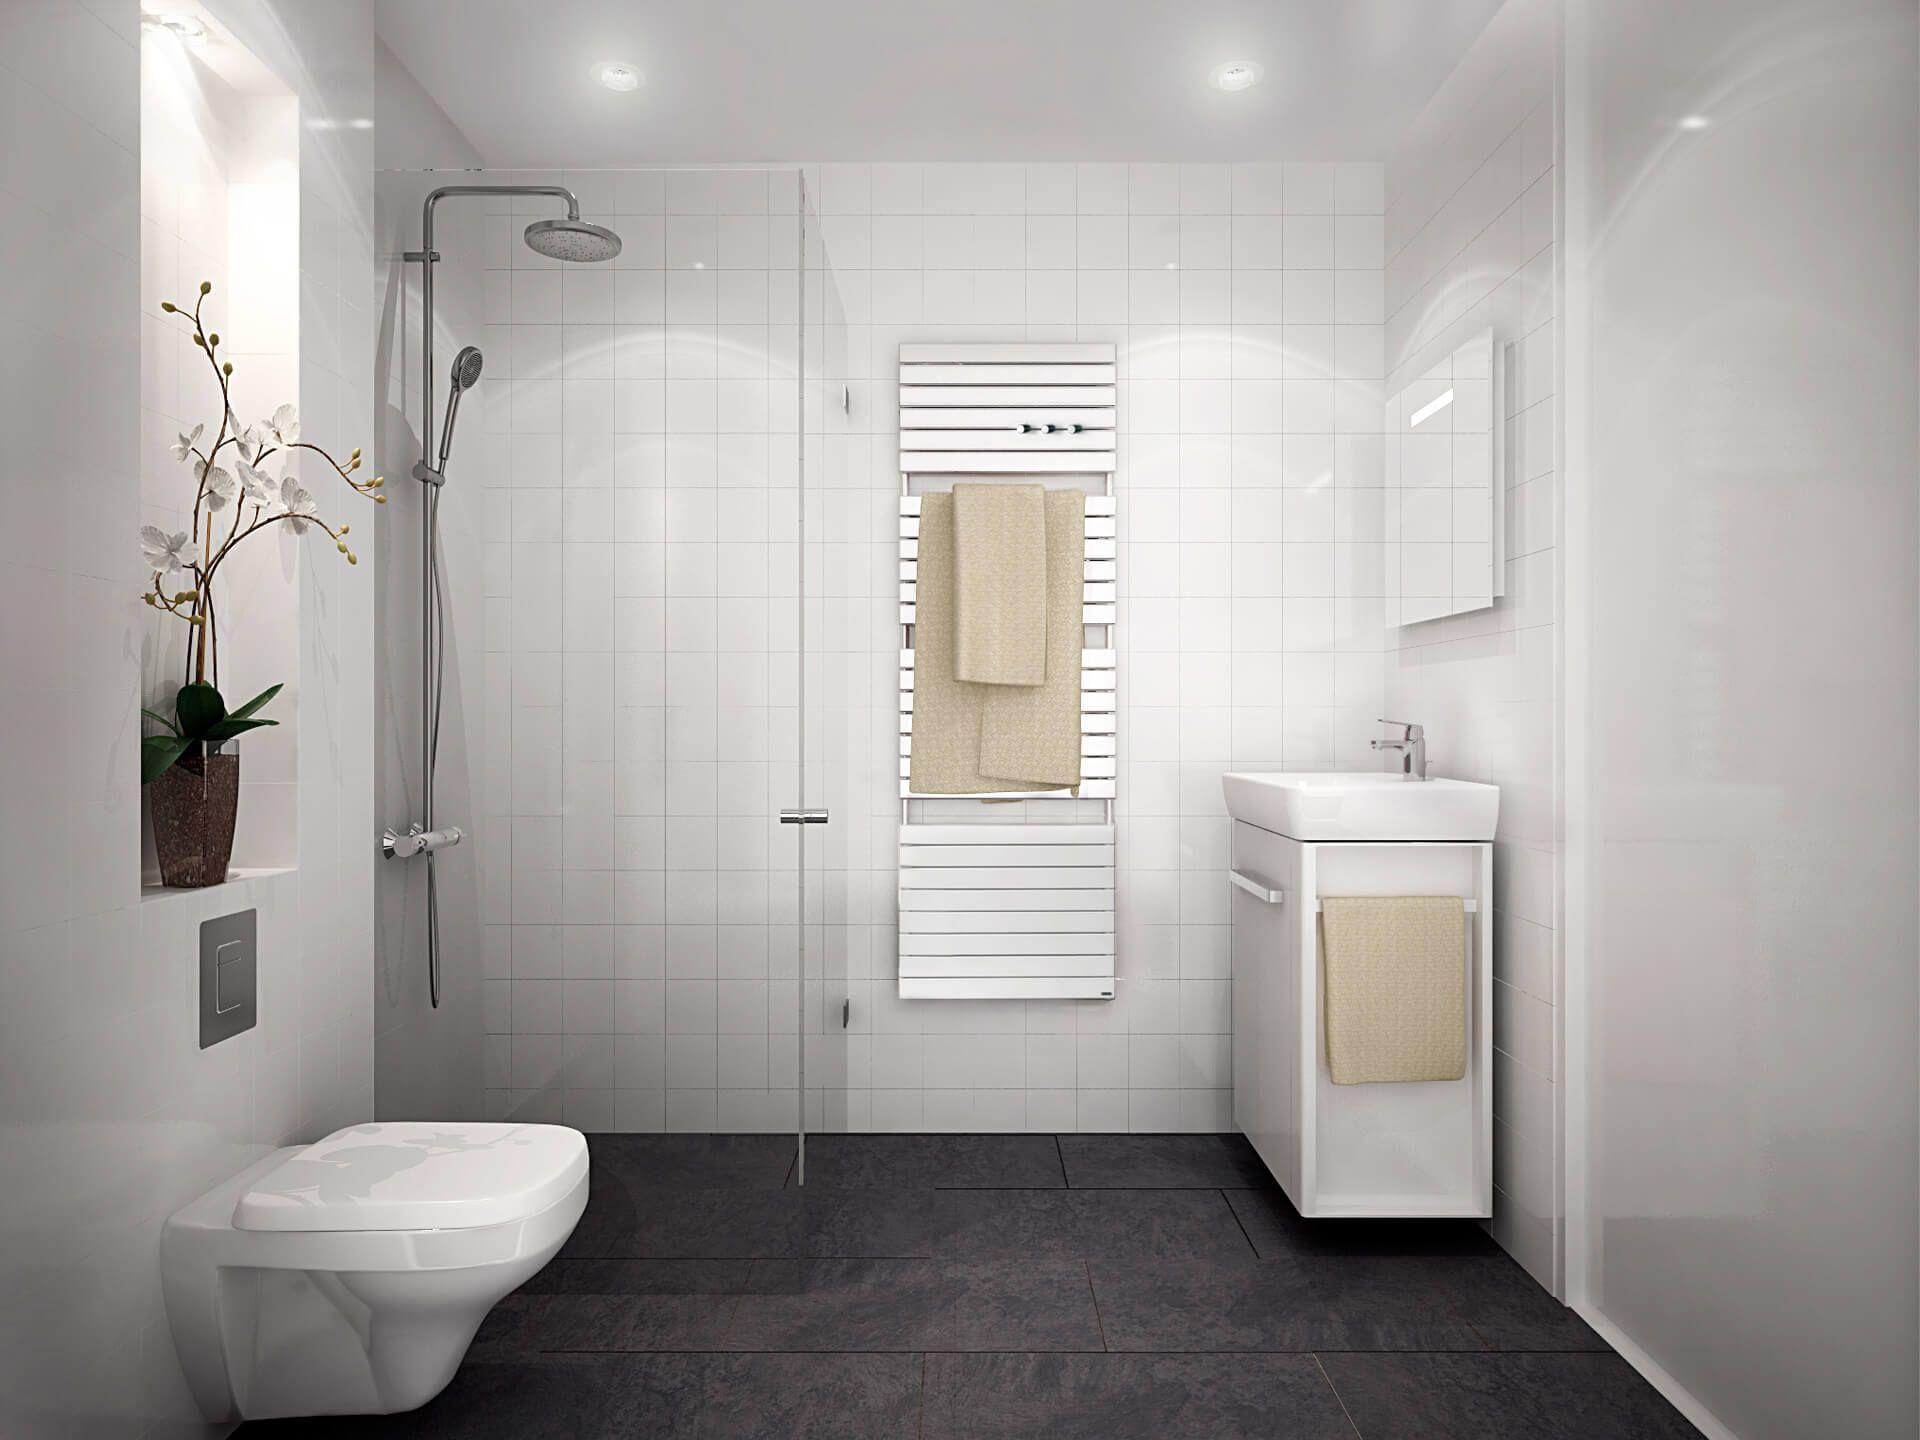 warmteservice badkamer ocean sun badkamers bathrooms gespot